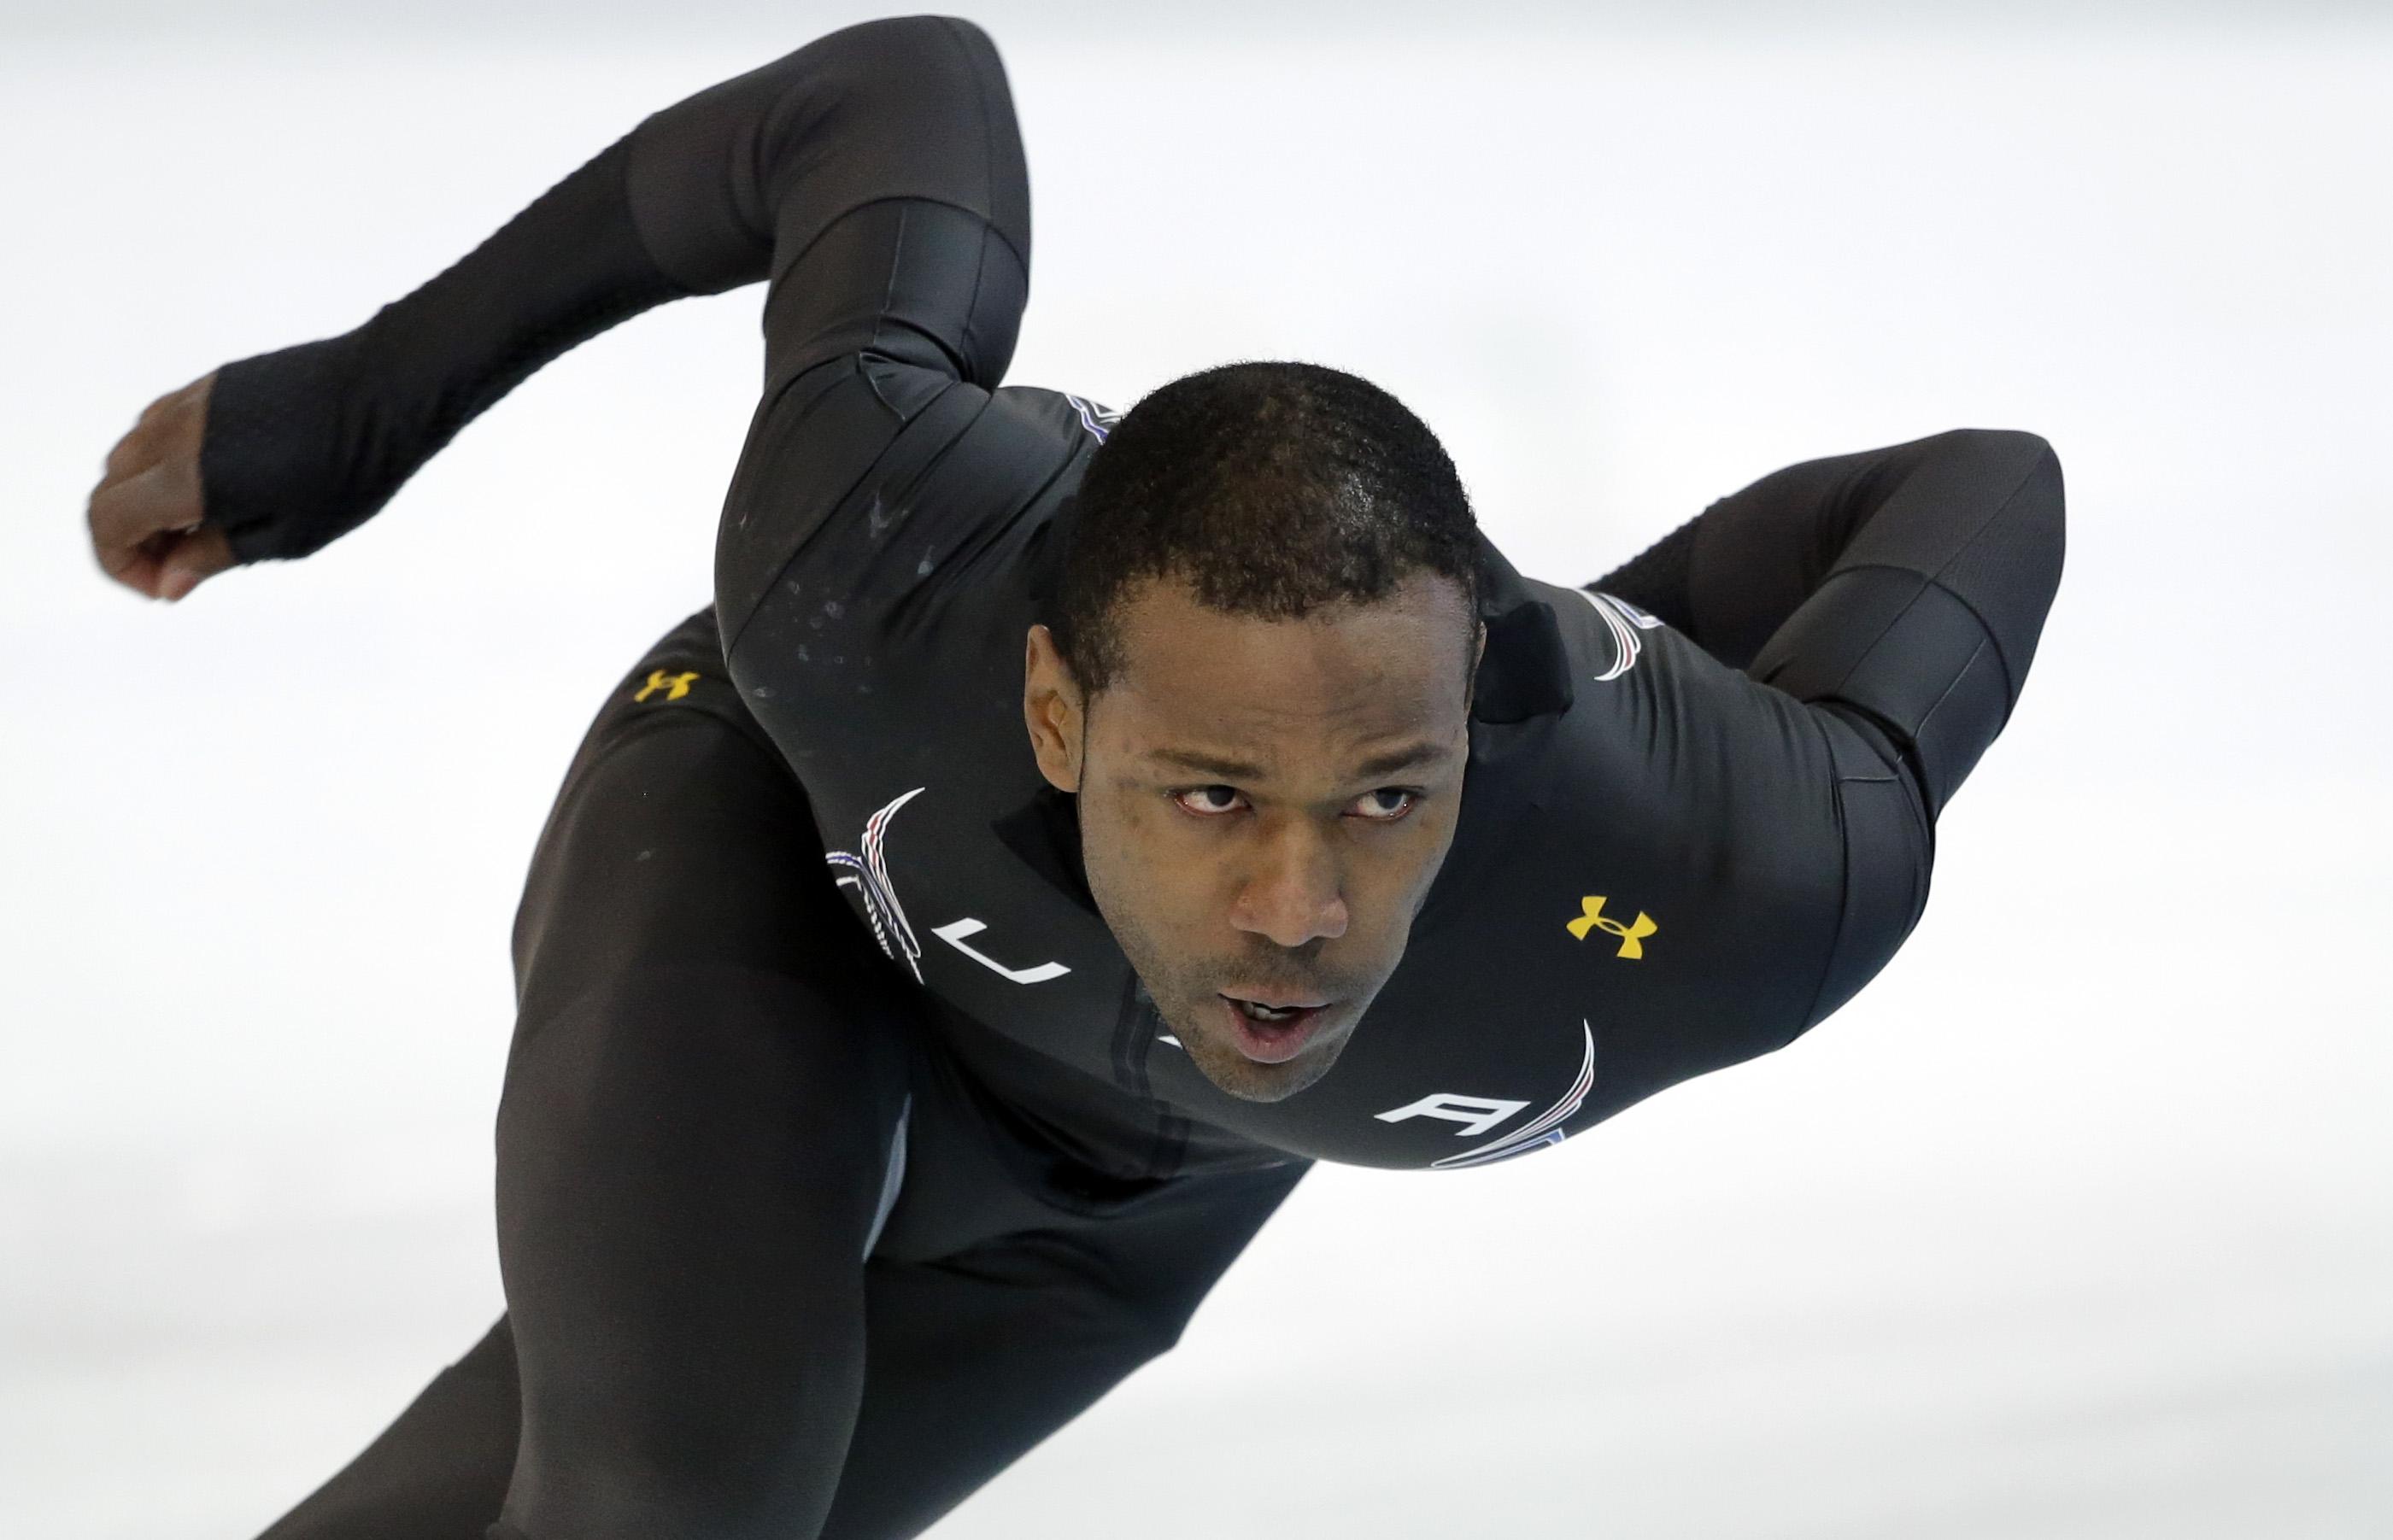 Speedskater Shani Davis of the U.S. trains at the Adler Arena Skating Center during the 2014 Winter Olympics in Sochi, Russia, Thursday, Feb. 6, 2014